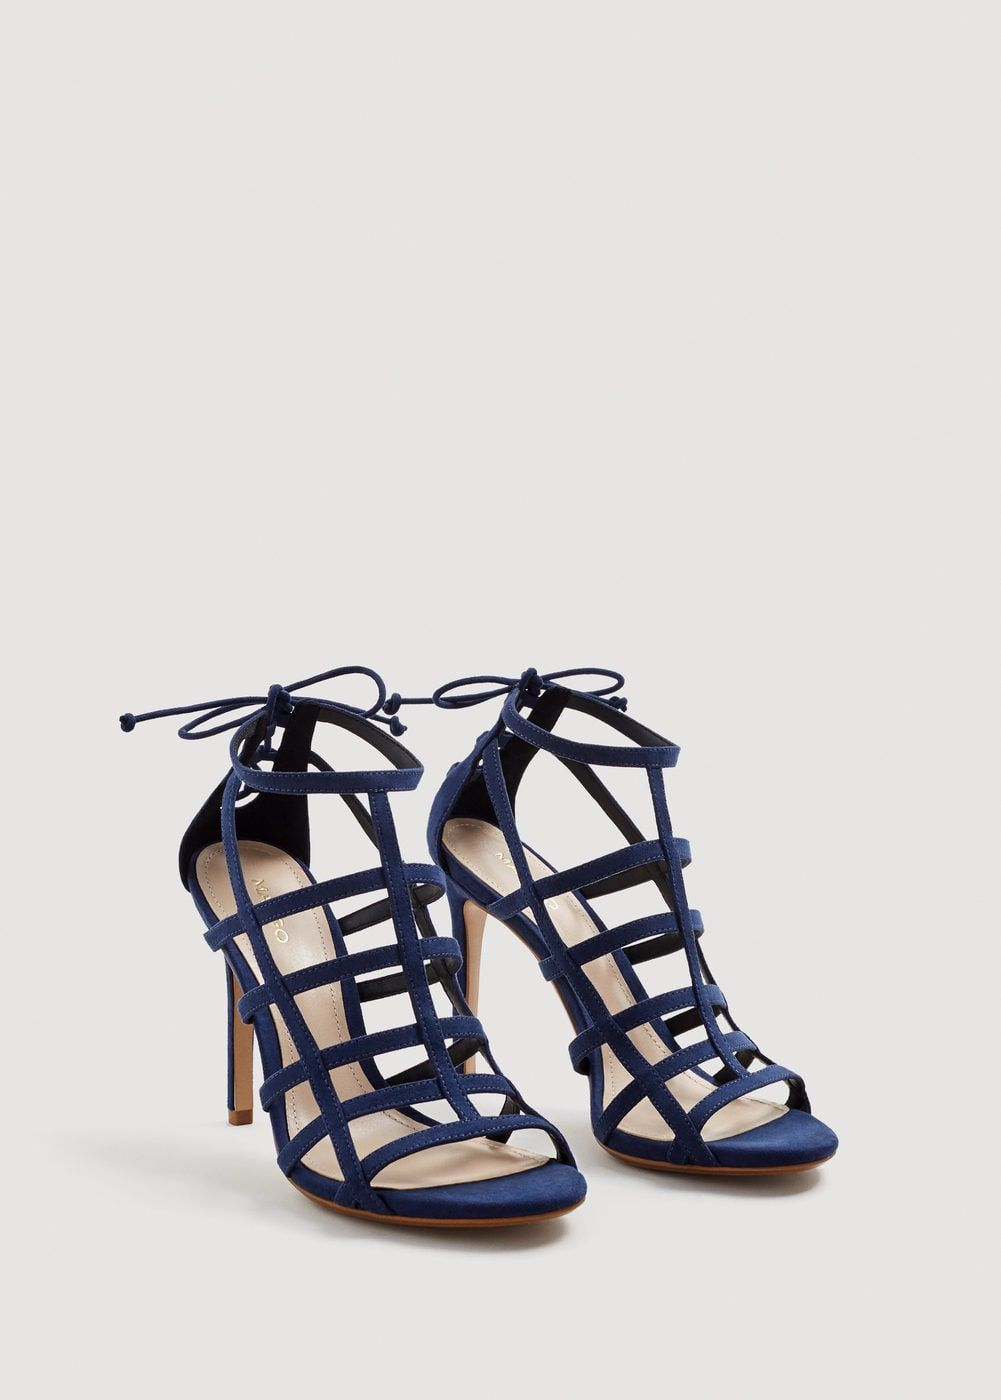 ShoesSandalias MujerI De Sandalia Tiras Tacón Want Those wOP0nk8